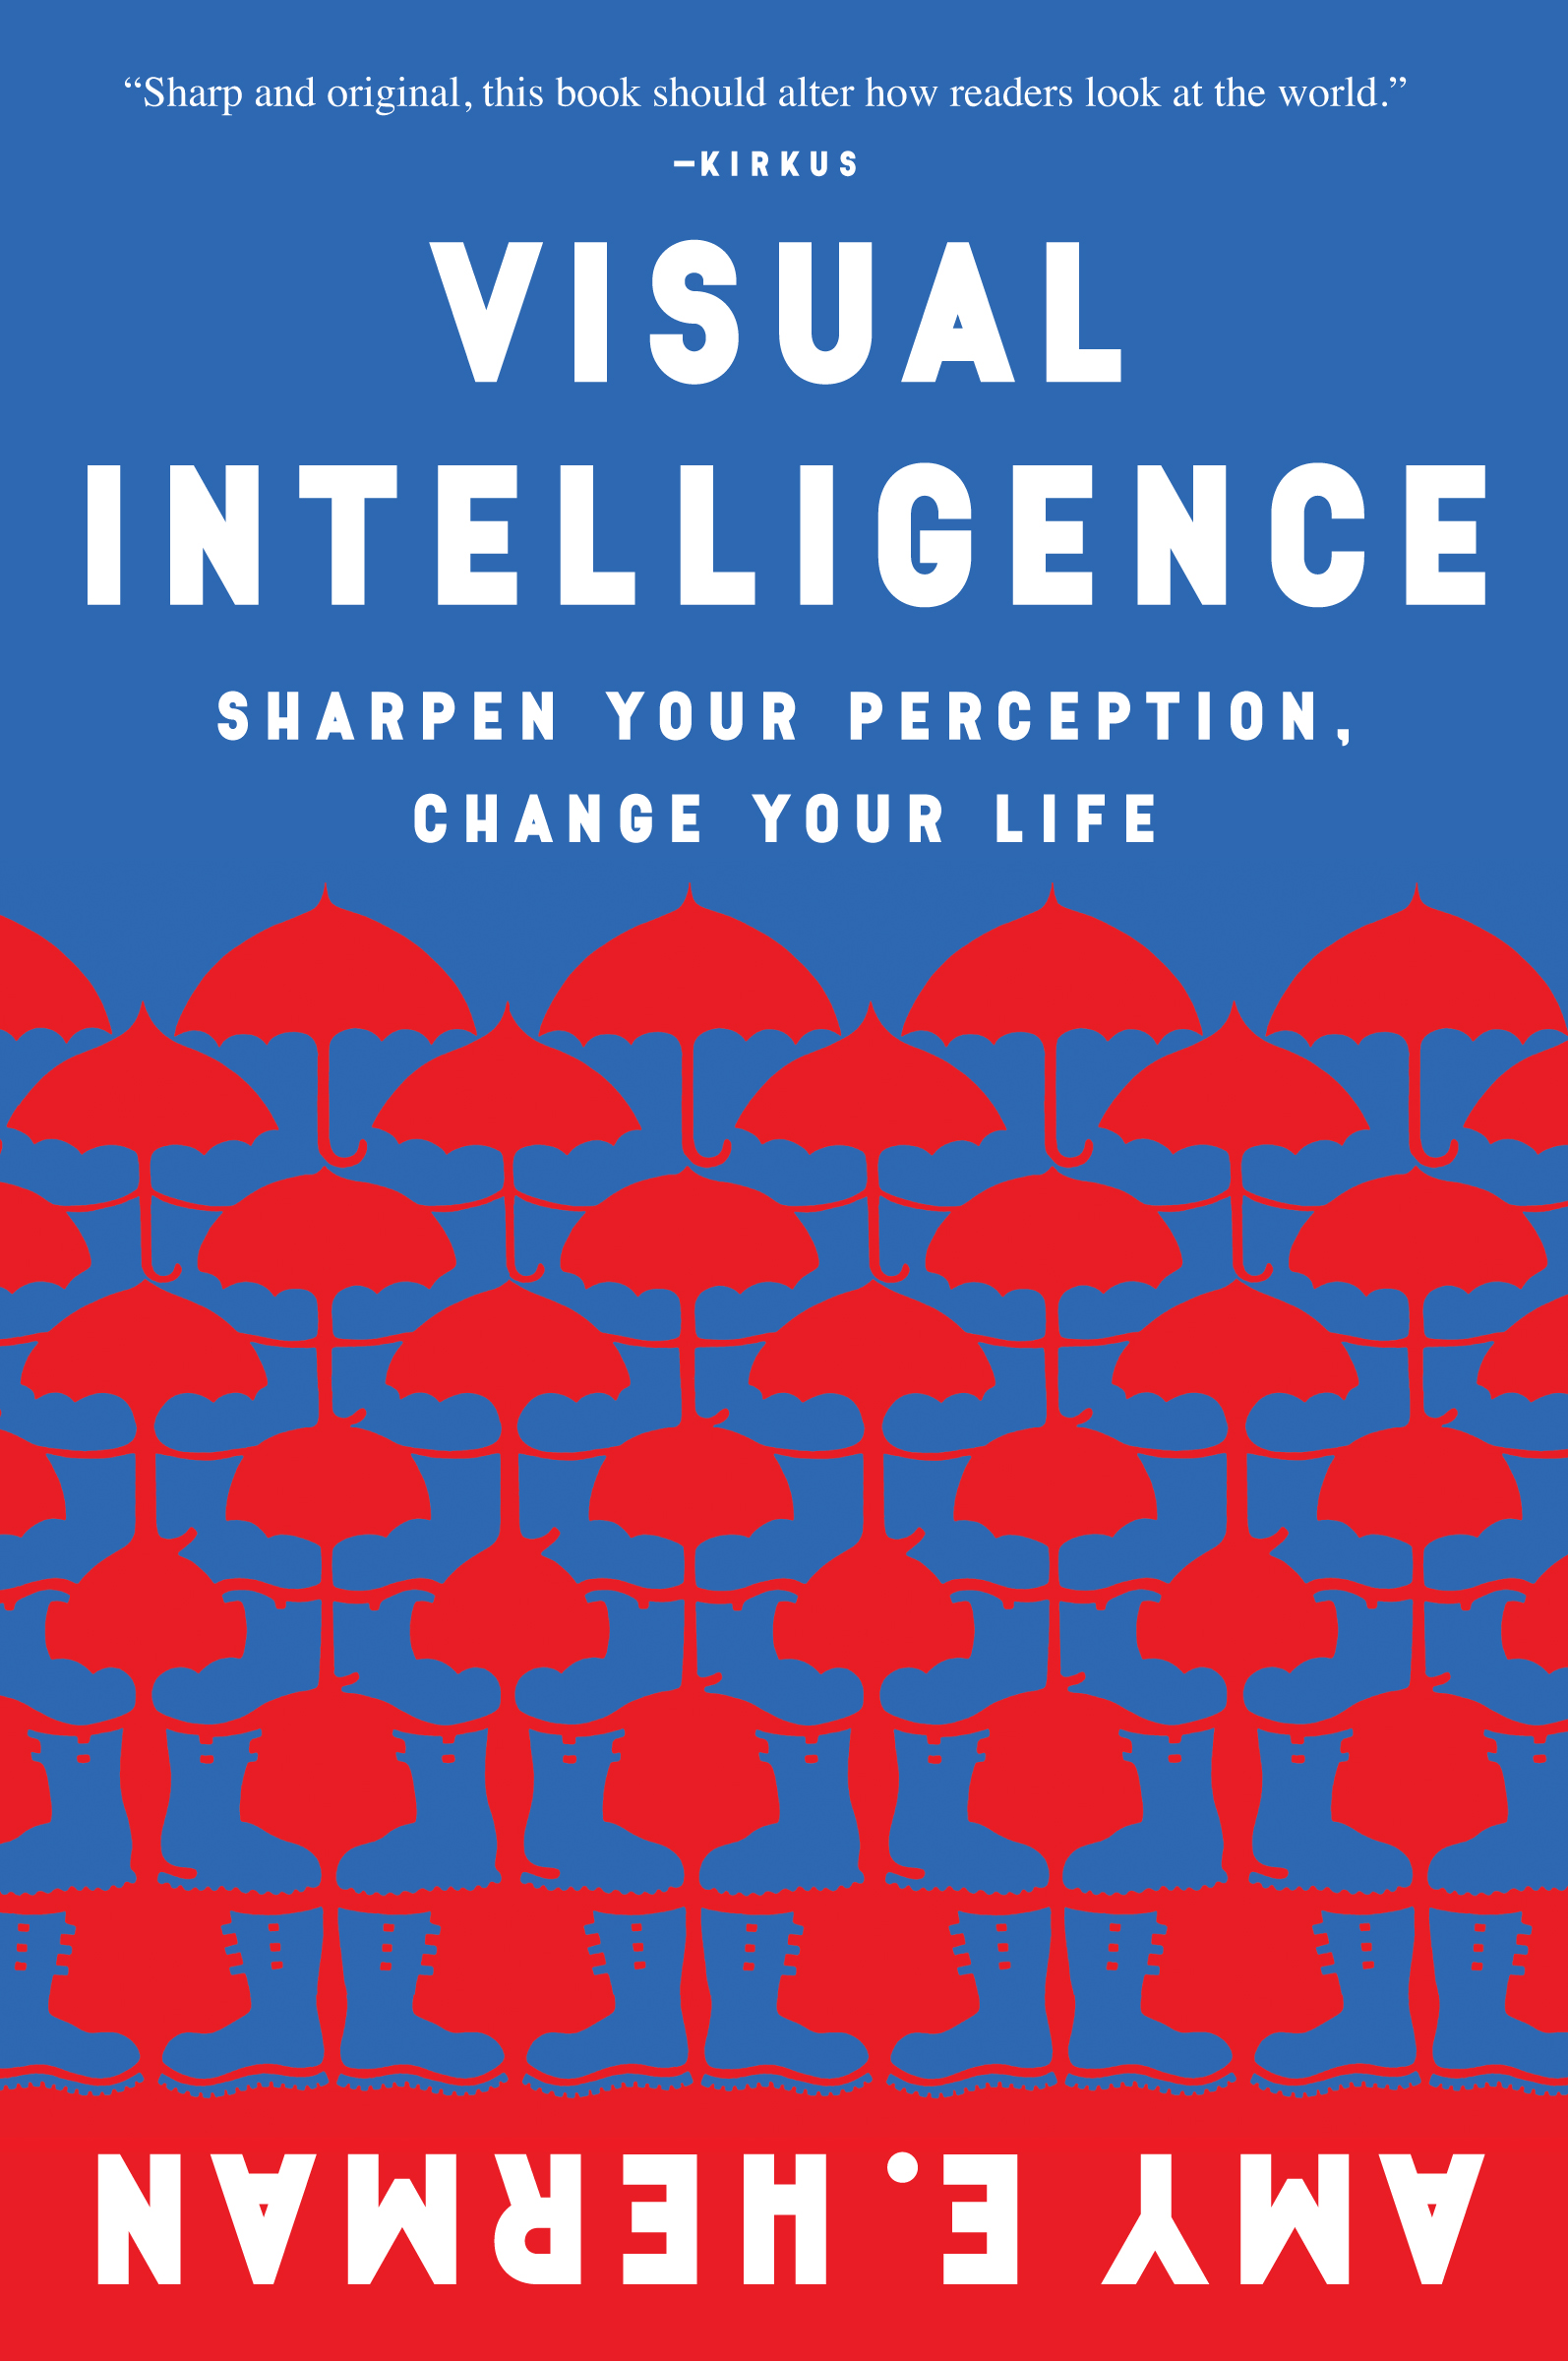 Visual Intelligence: The Art of Perception